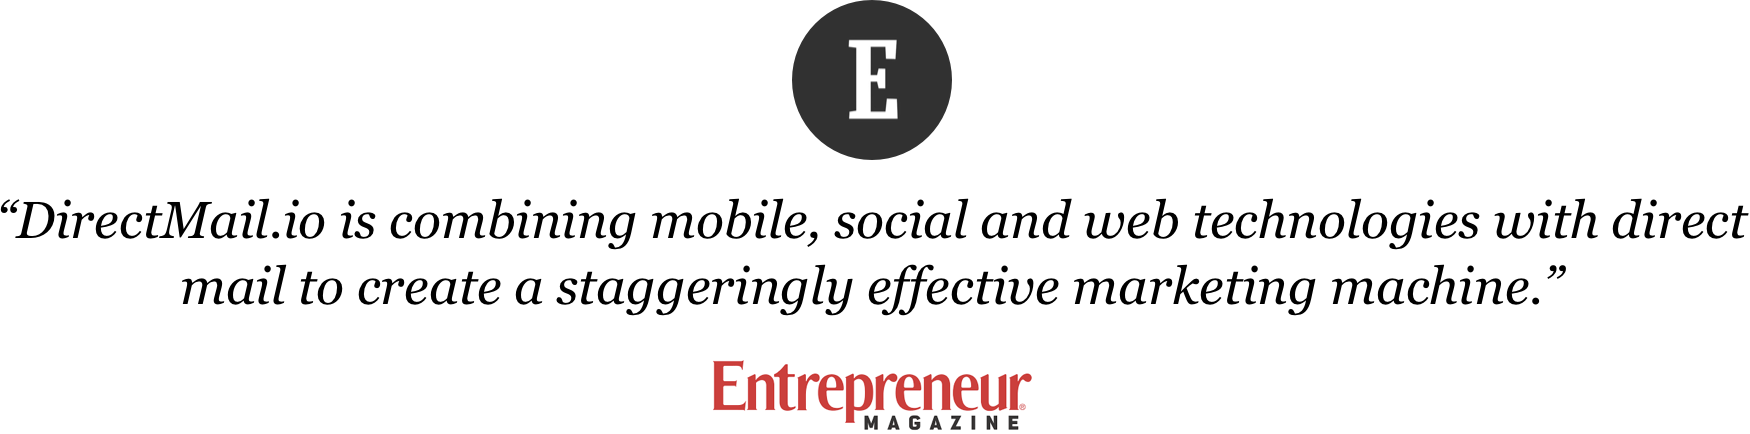 DMio_Entrepreneur